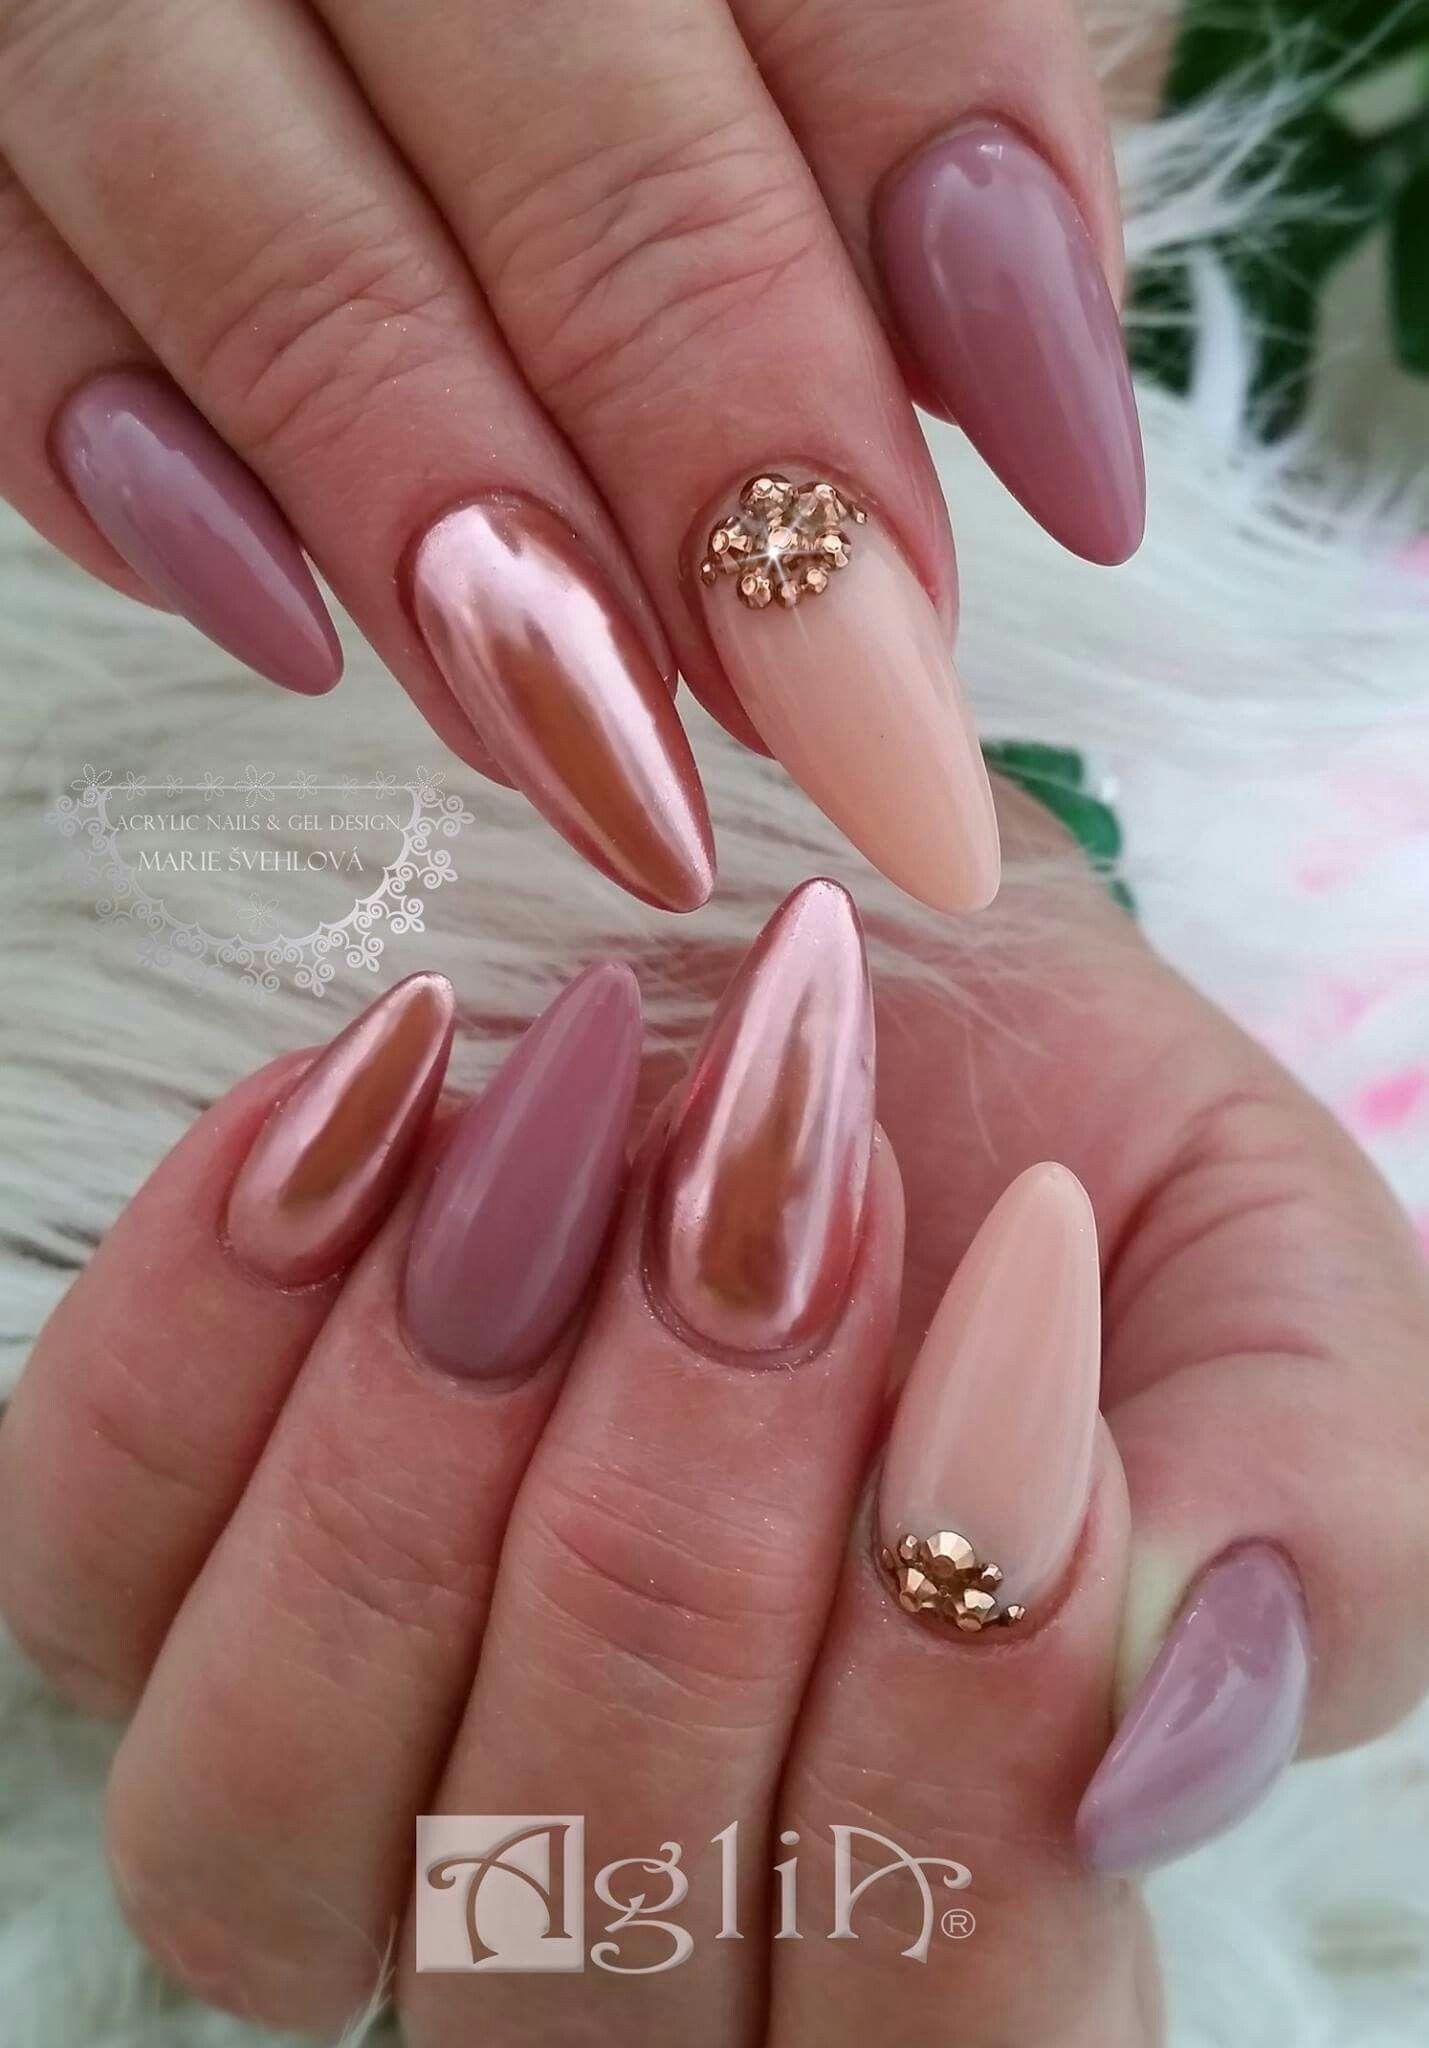 Acrylic Nails Gel Design Rose Gold Pigment